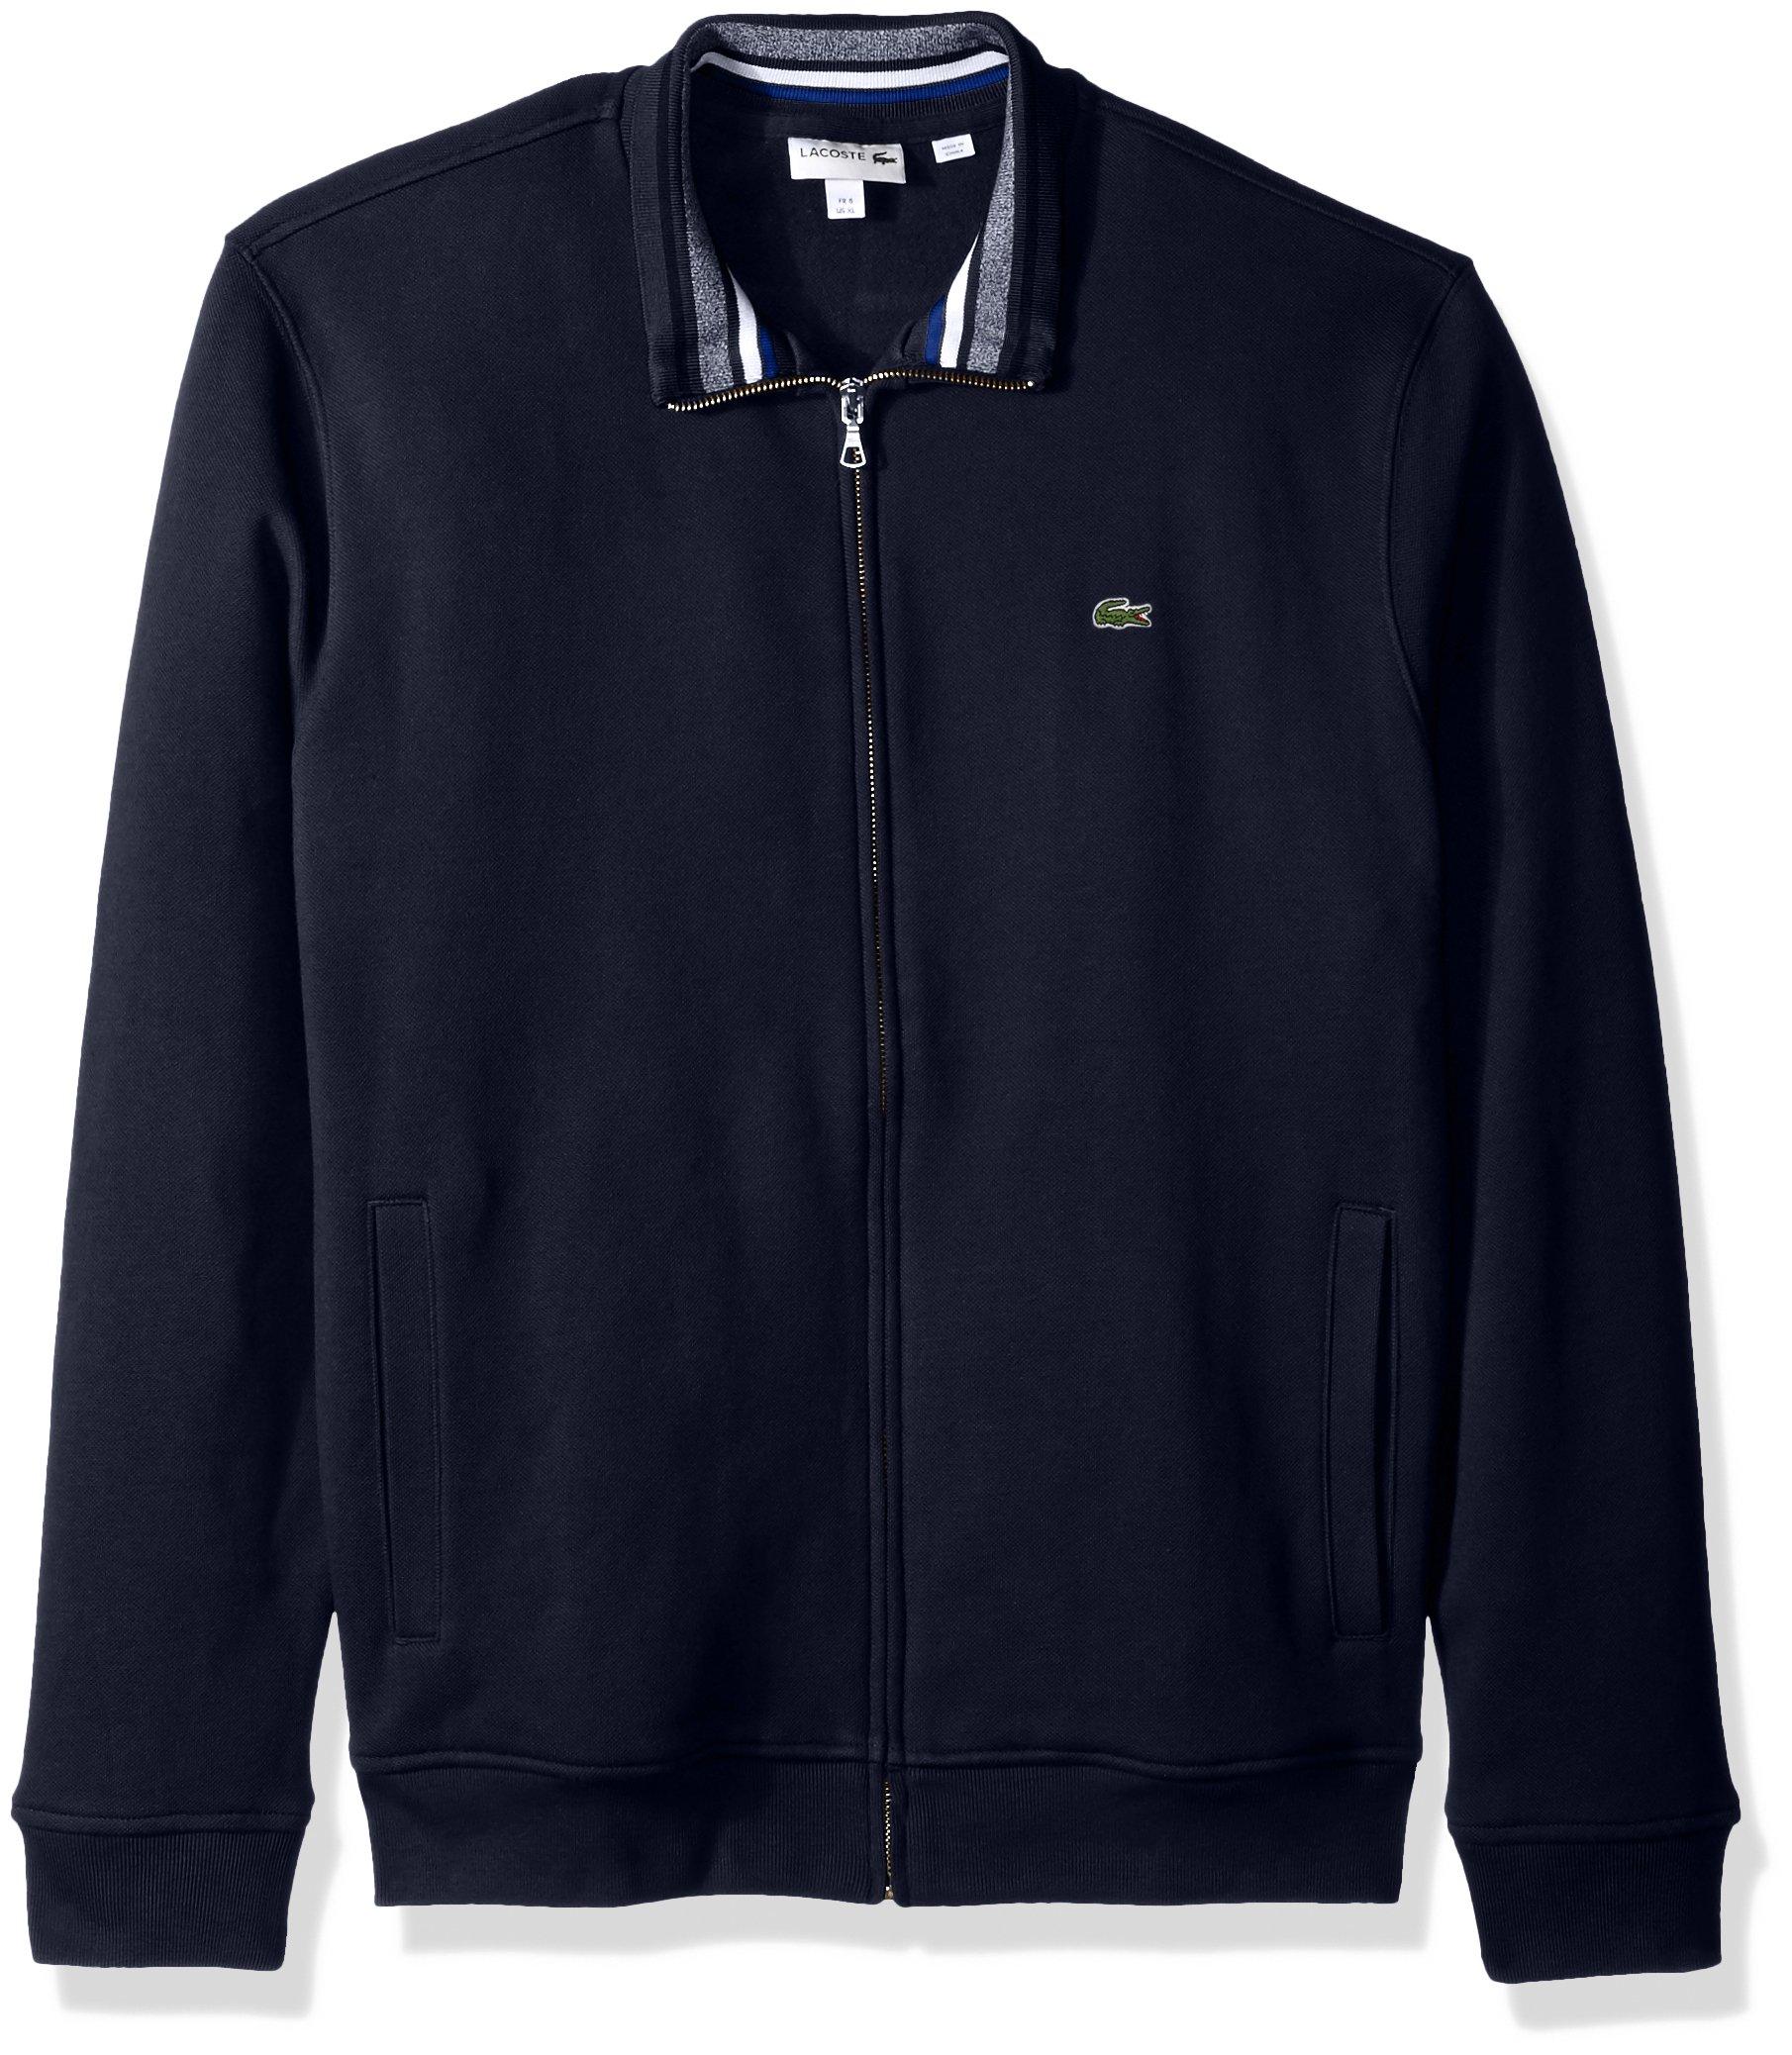 Lacoste Men's Semi Fancy Brushed Pique Fleece Full Zip Sweatshirt, Navy Blue/Multi, 7